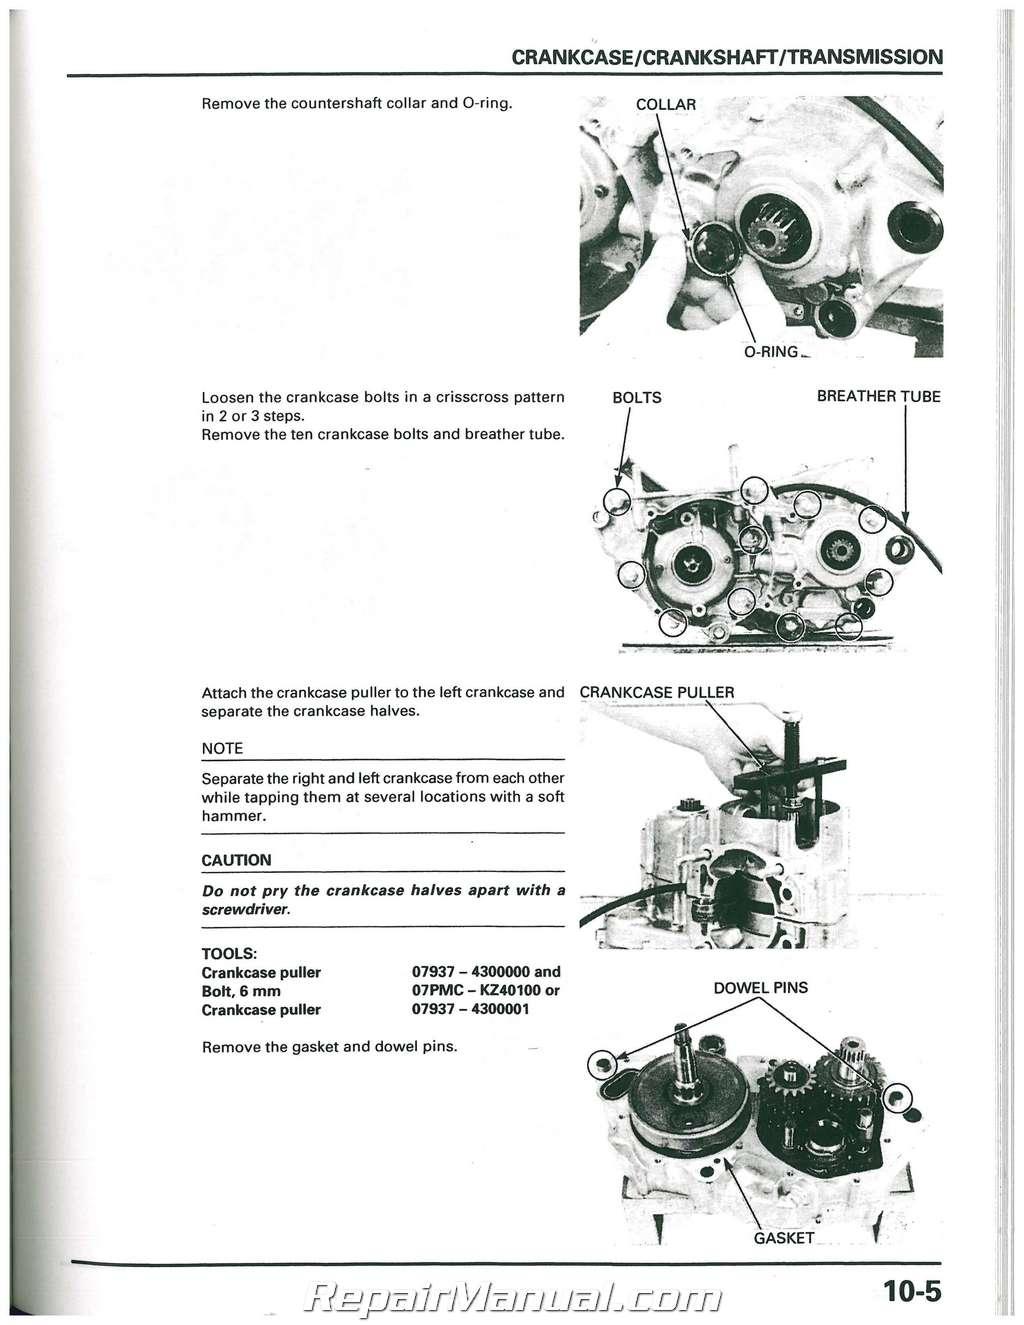 100 1998 service manual for yamaha yz125 yz125 part. Black Bedroom Furniture Sets. Home Design Ideas